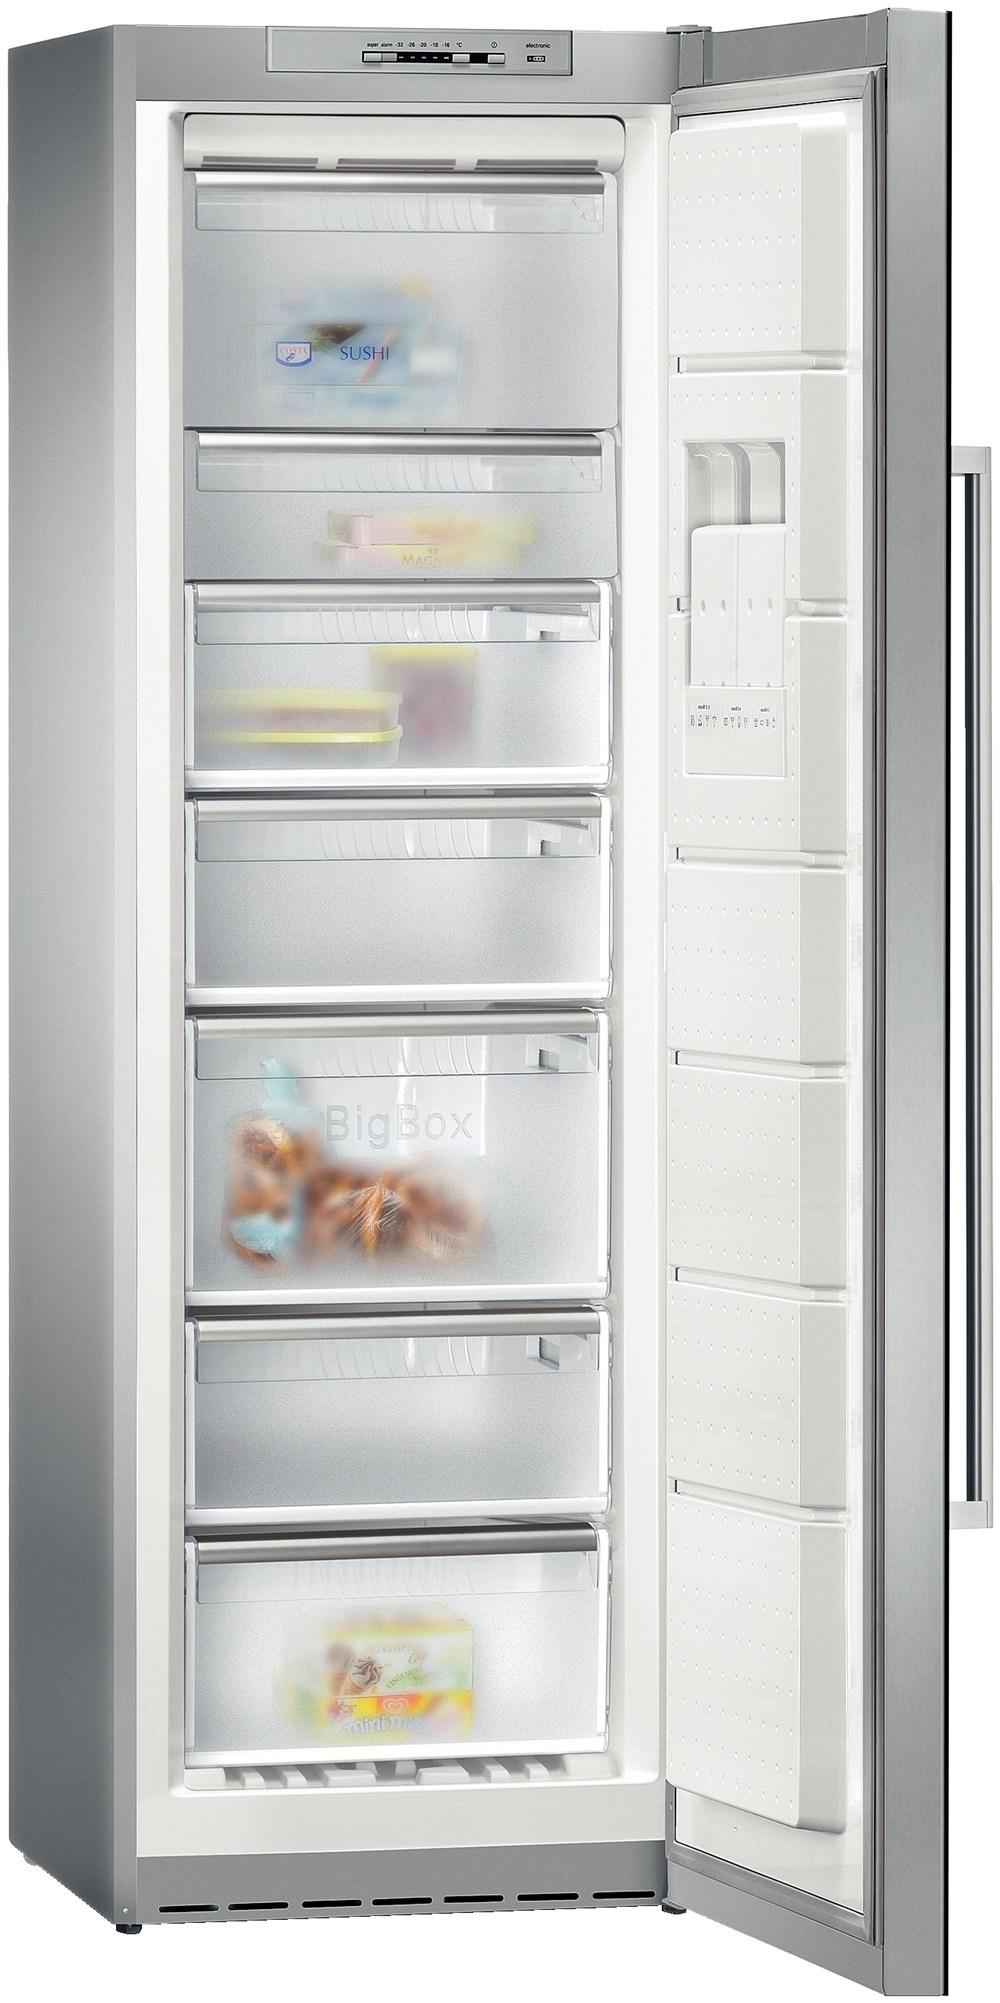 congelador gs32ns52 red cocina noroeste